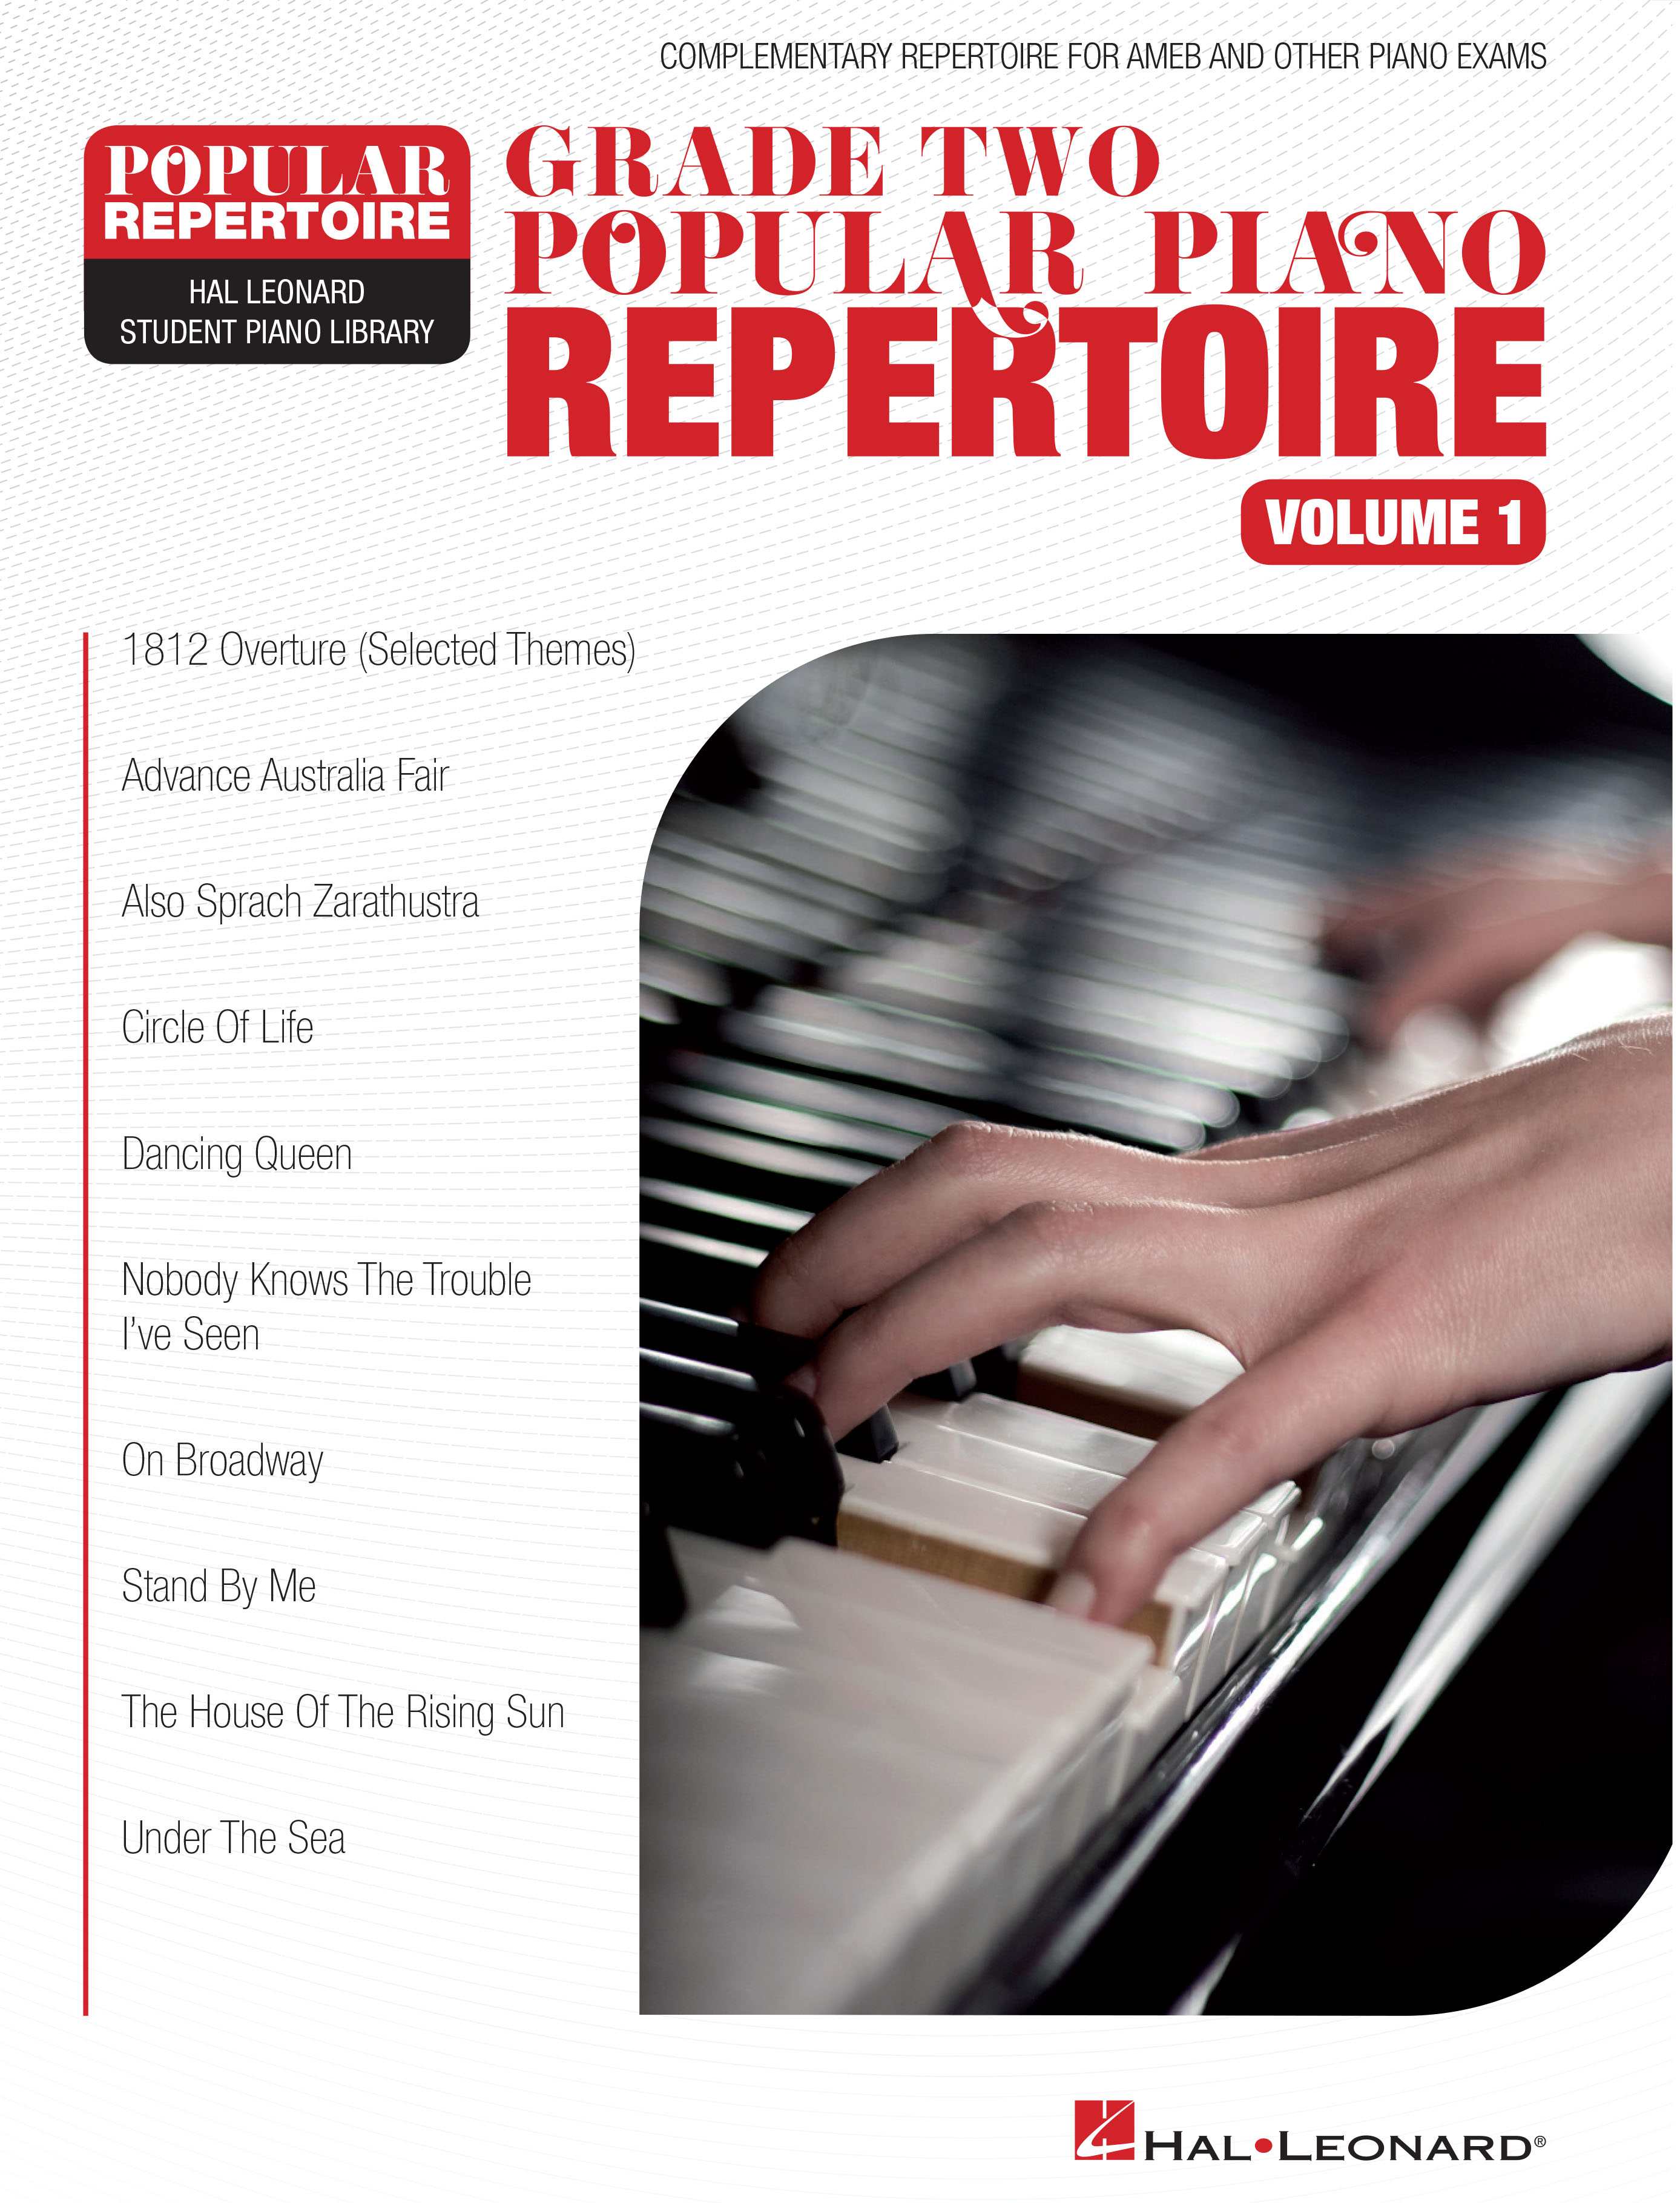 Helpful Ameb Piano Series 16 Sixth Grade Long Performance Life Music Theory & Ear Training